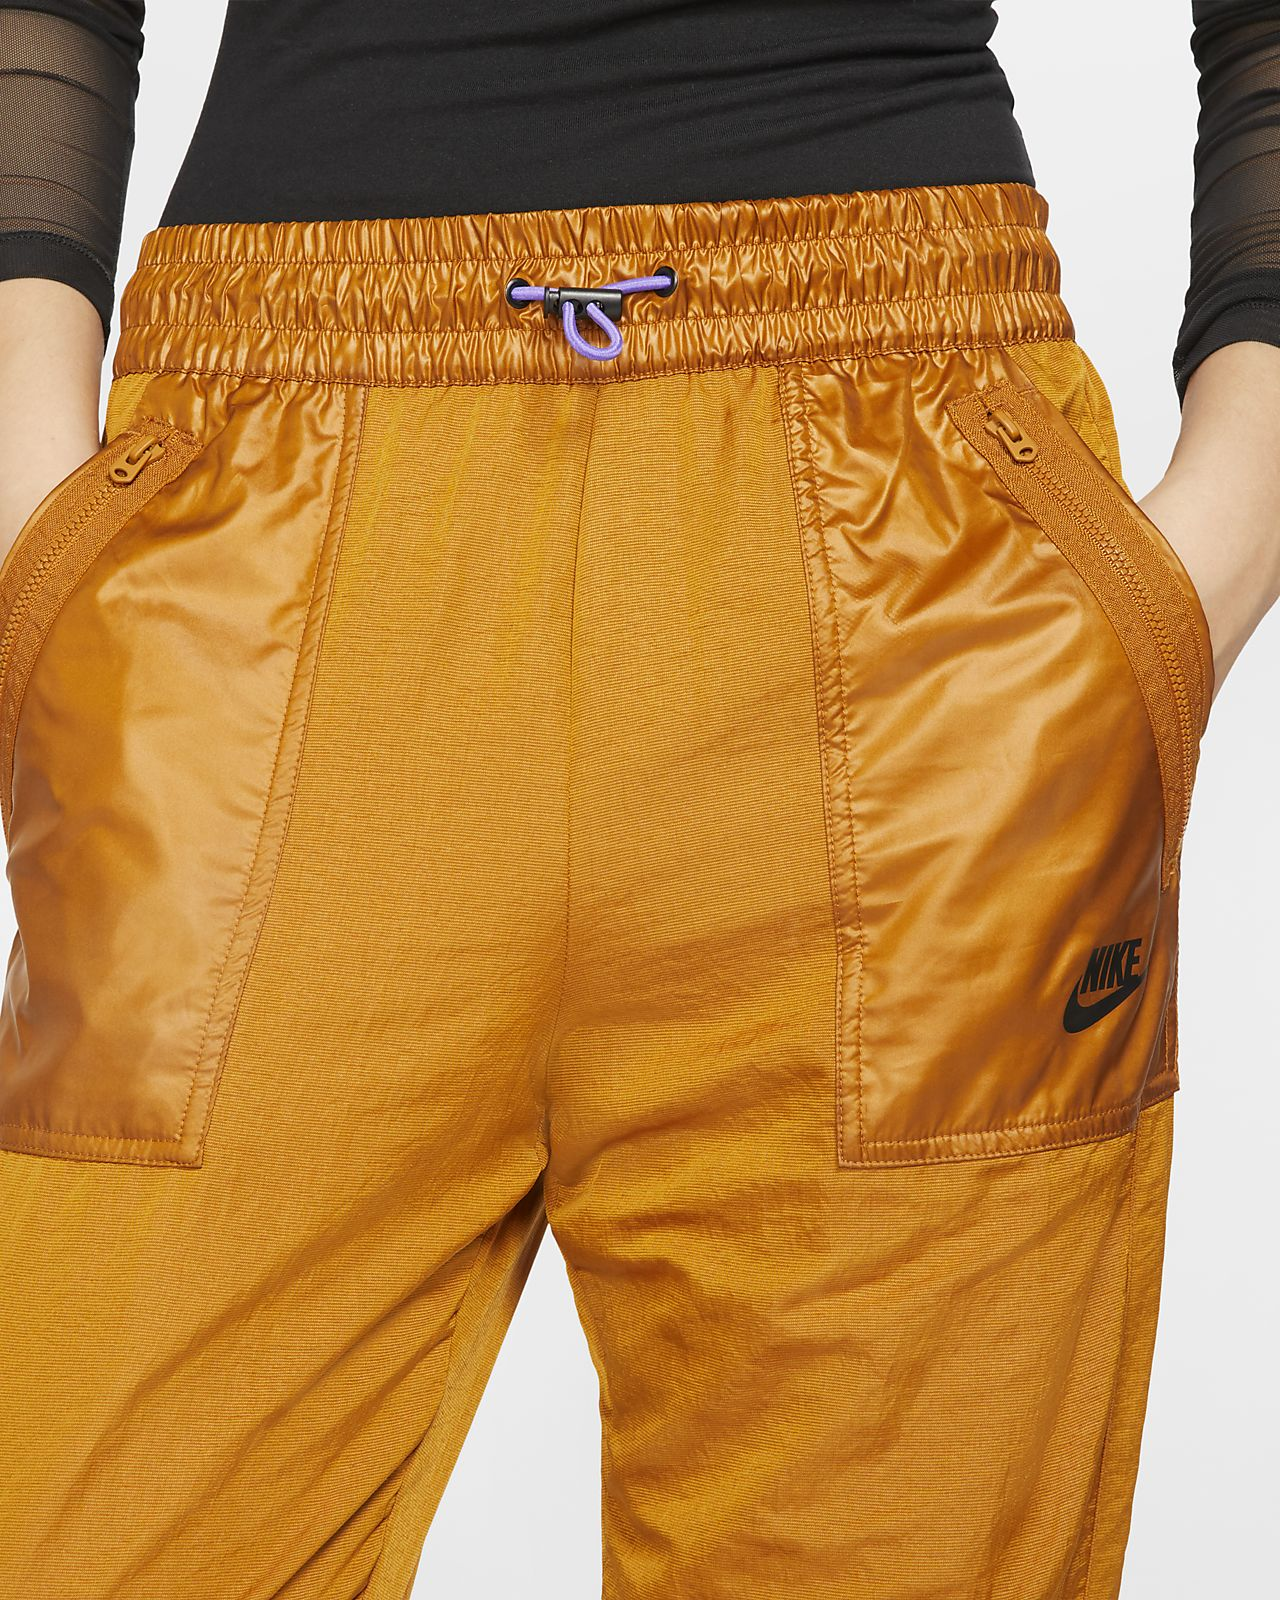 Tissé Tissé Pantalon Nike Cargo Cargo Sportswear Pantalon Nike 4RL3qA5j